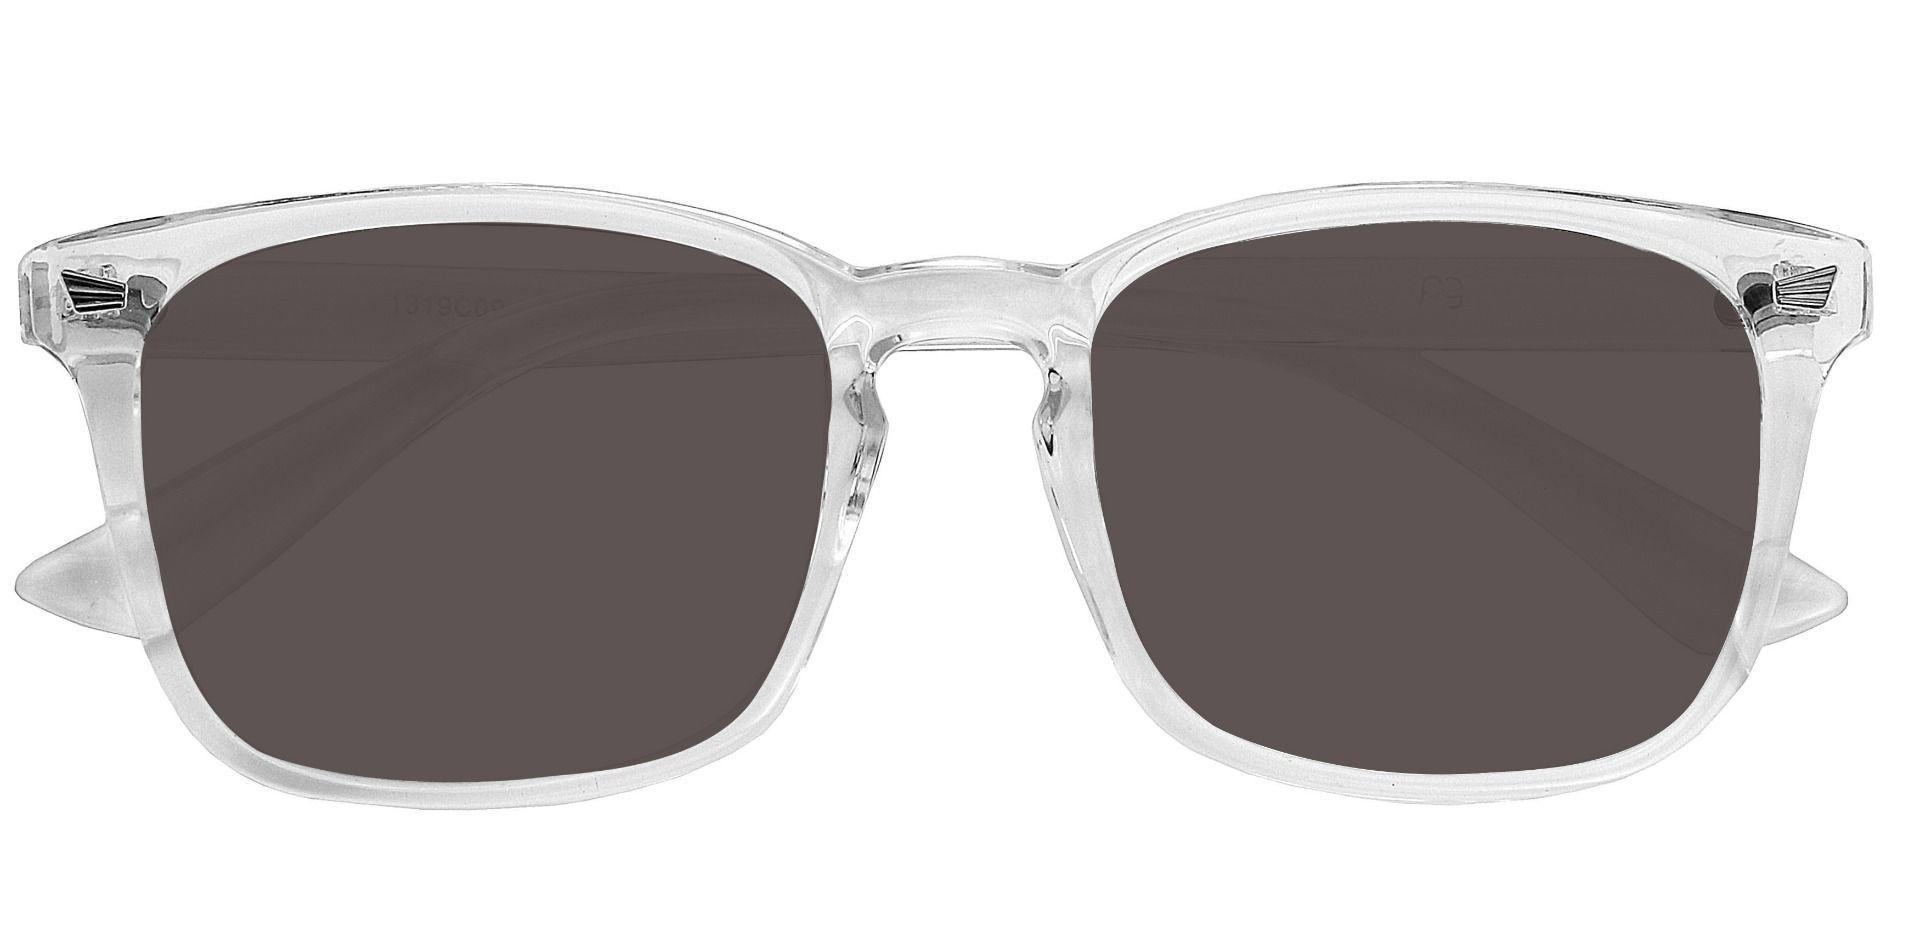 Rogan Square Prescription Sunglasses - Clear Frame With Gray Lenses